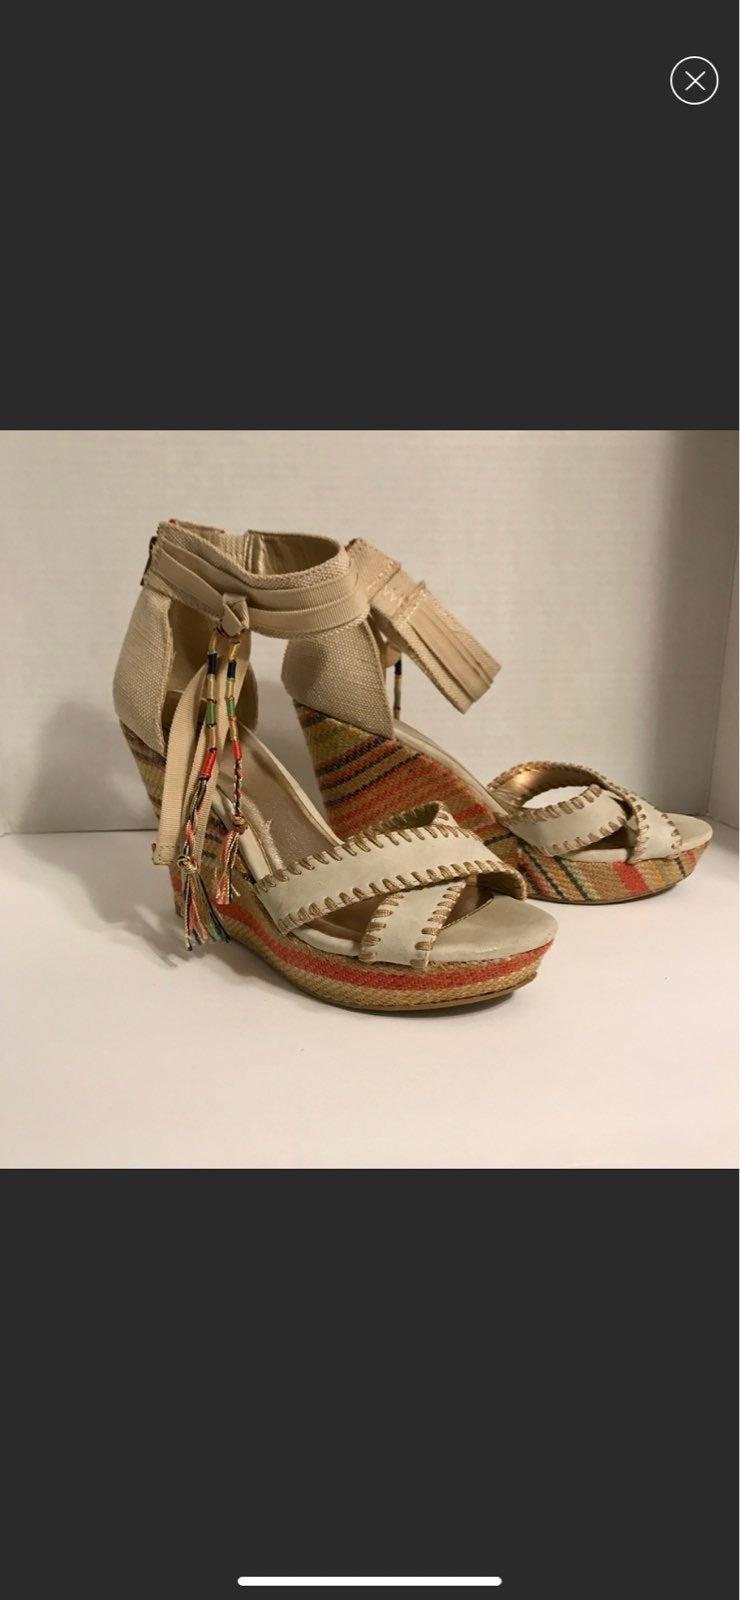 BKE Sole Wedge Sandals sz 8.5